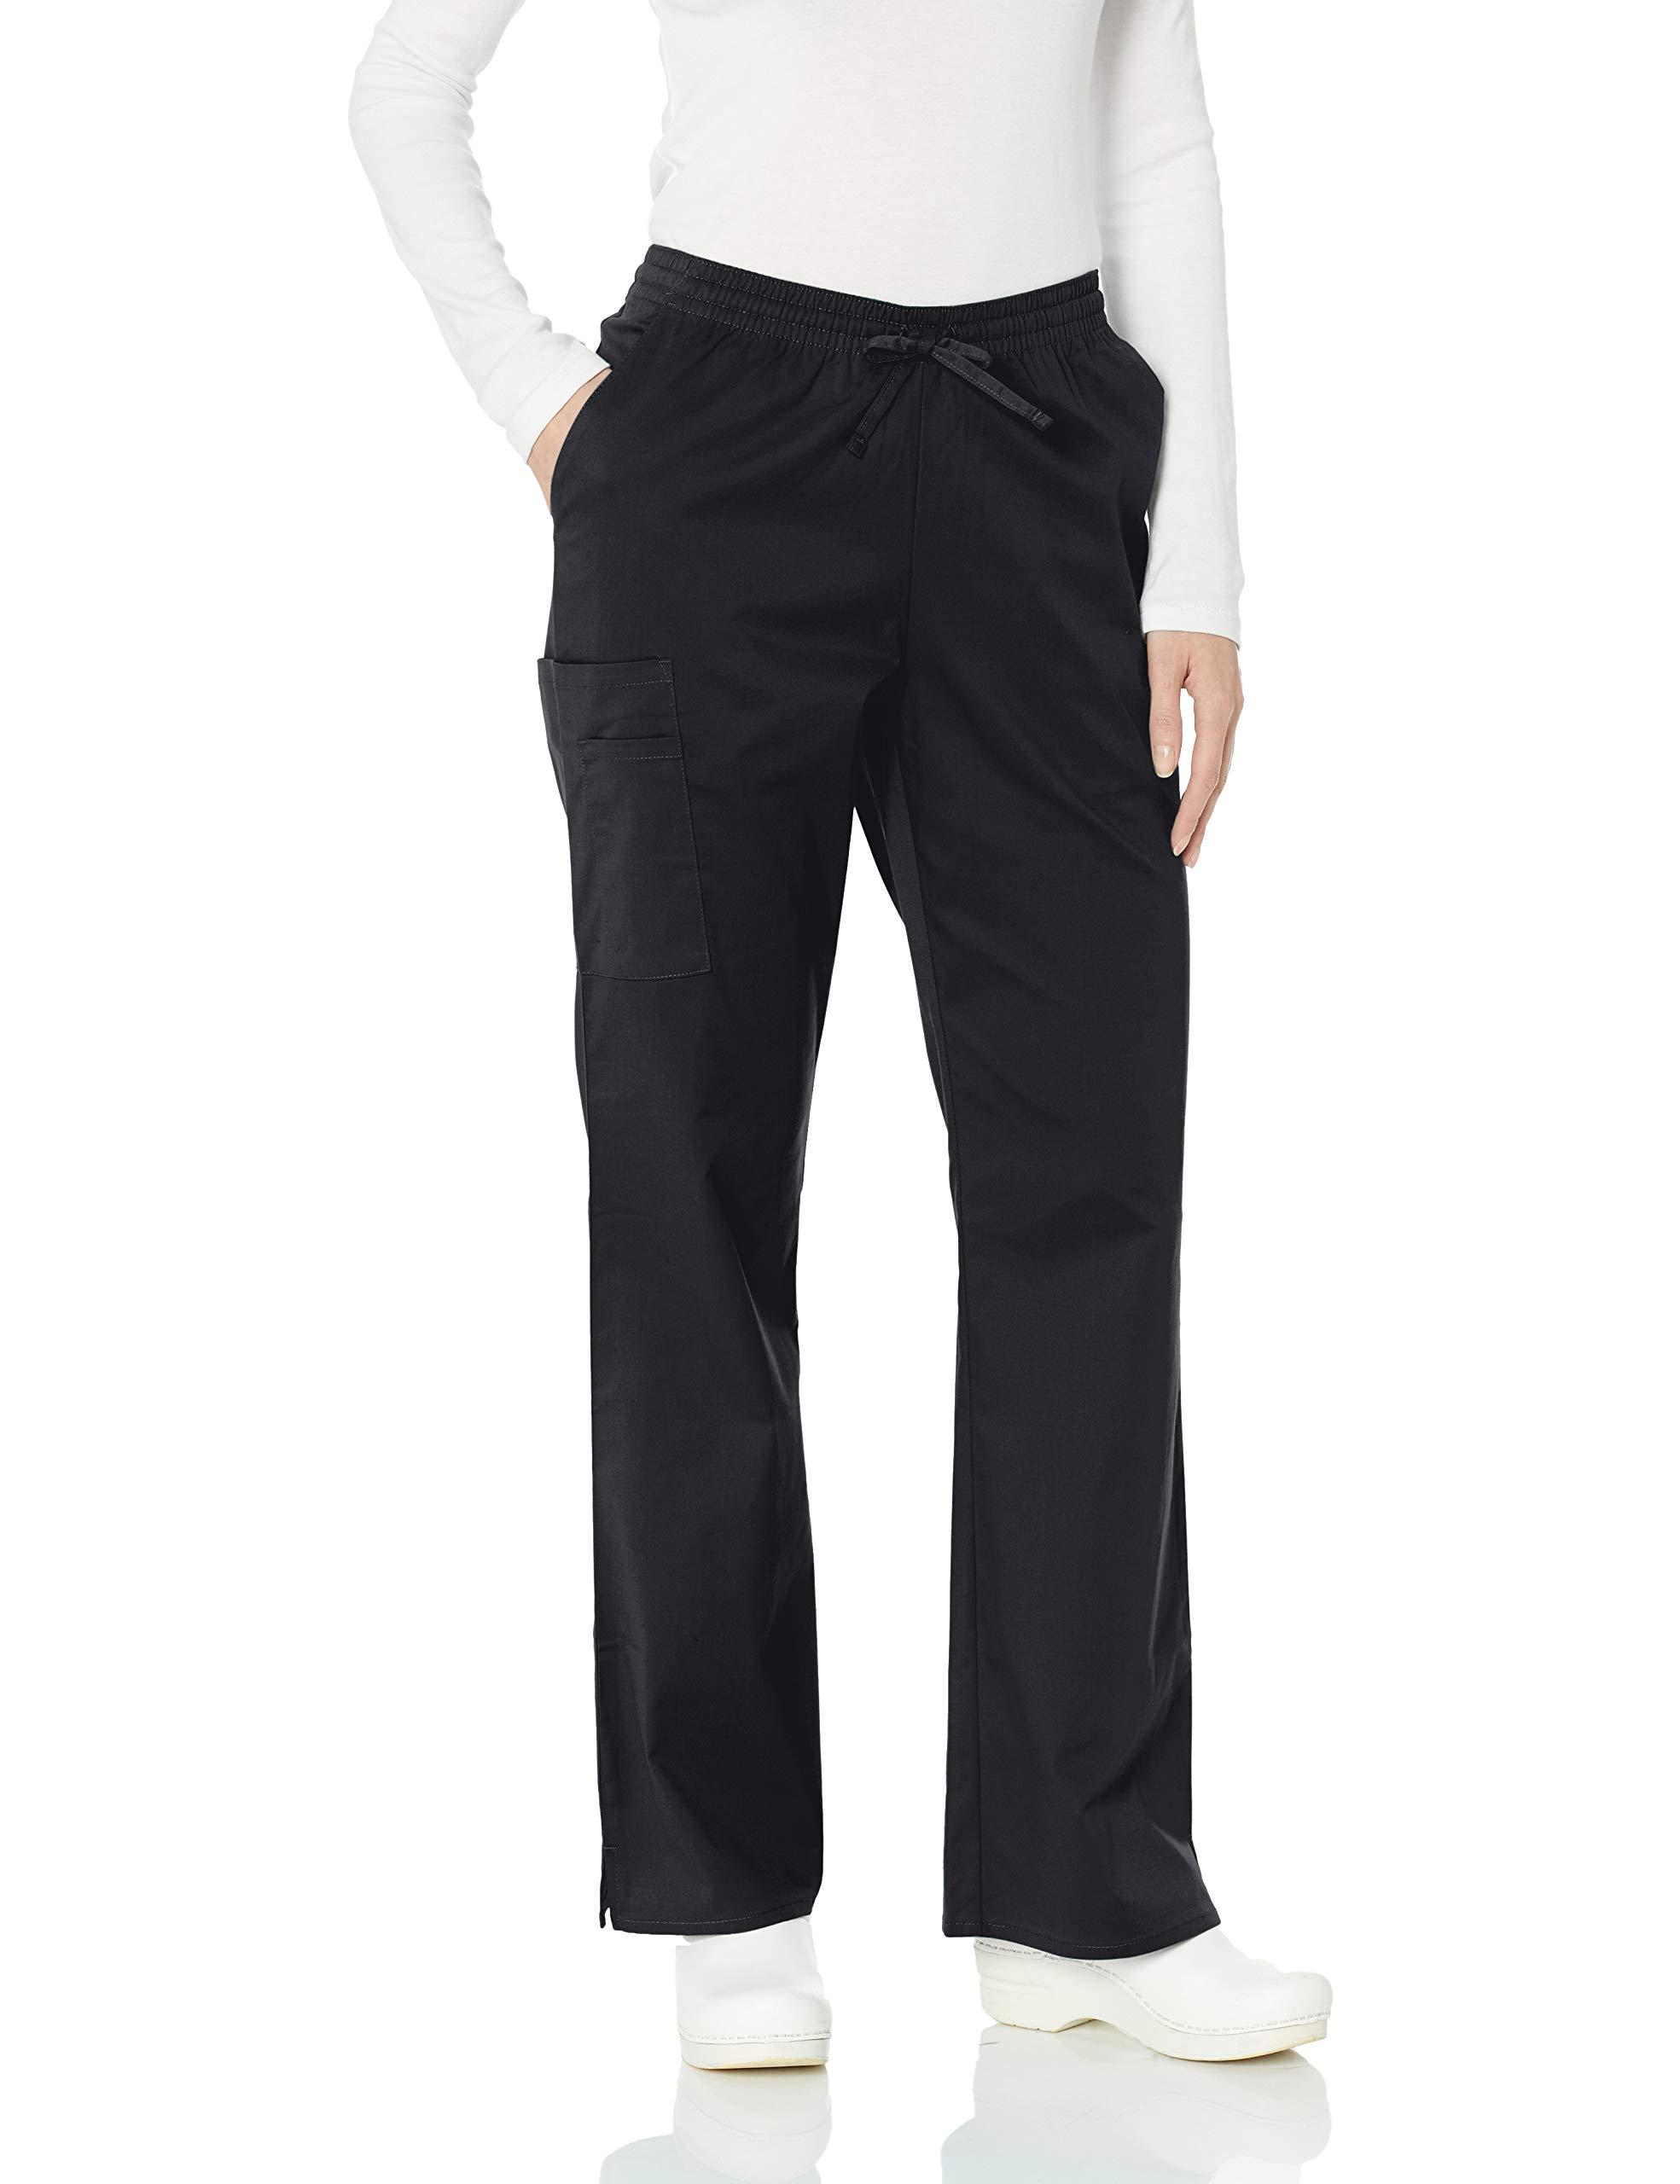 Amazon Essentials Women's Quick-Dry Stretch Scrub Pant, Black, Medium by Amazon Essentials